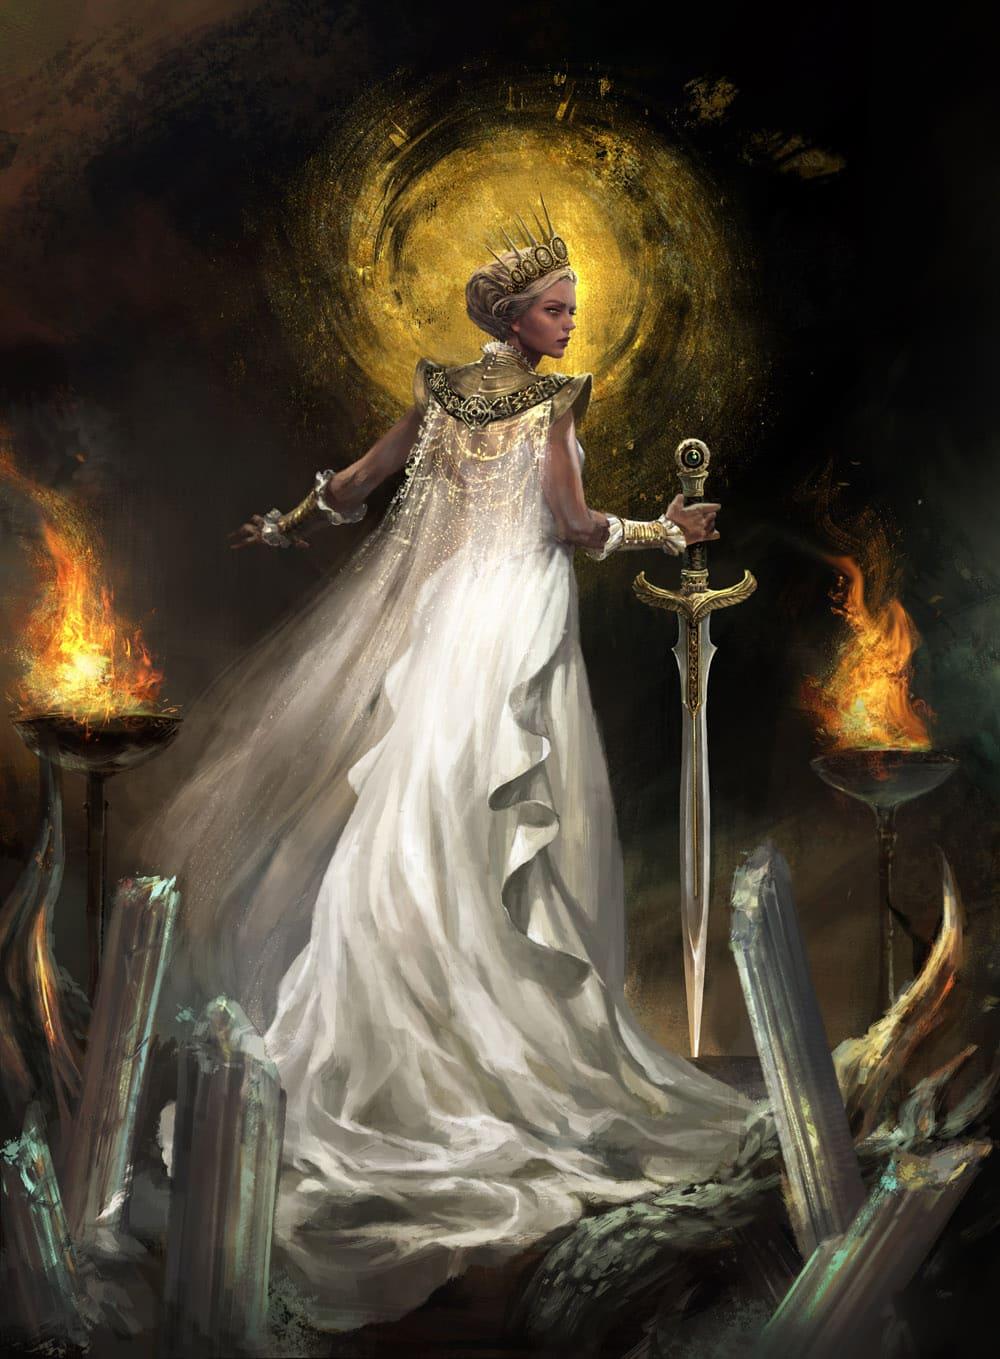 X:\2.行銷處\03. 各遊戲專案\29. Iron Throne:鐵之王座\04. 新聞稿相關\201811223_副官系統\New Protrait_ Queen.jpg